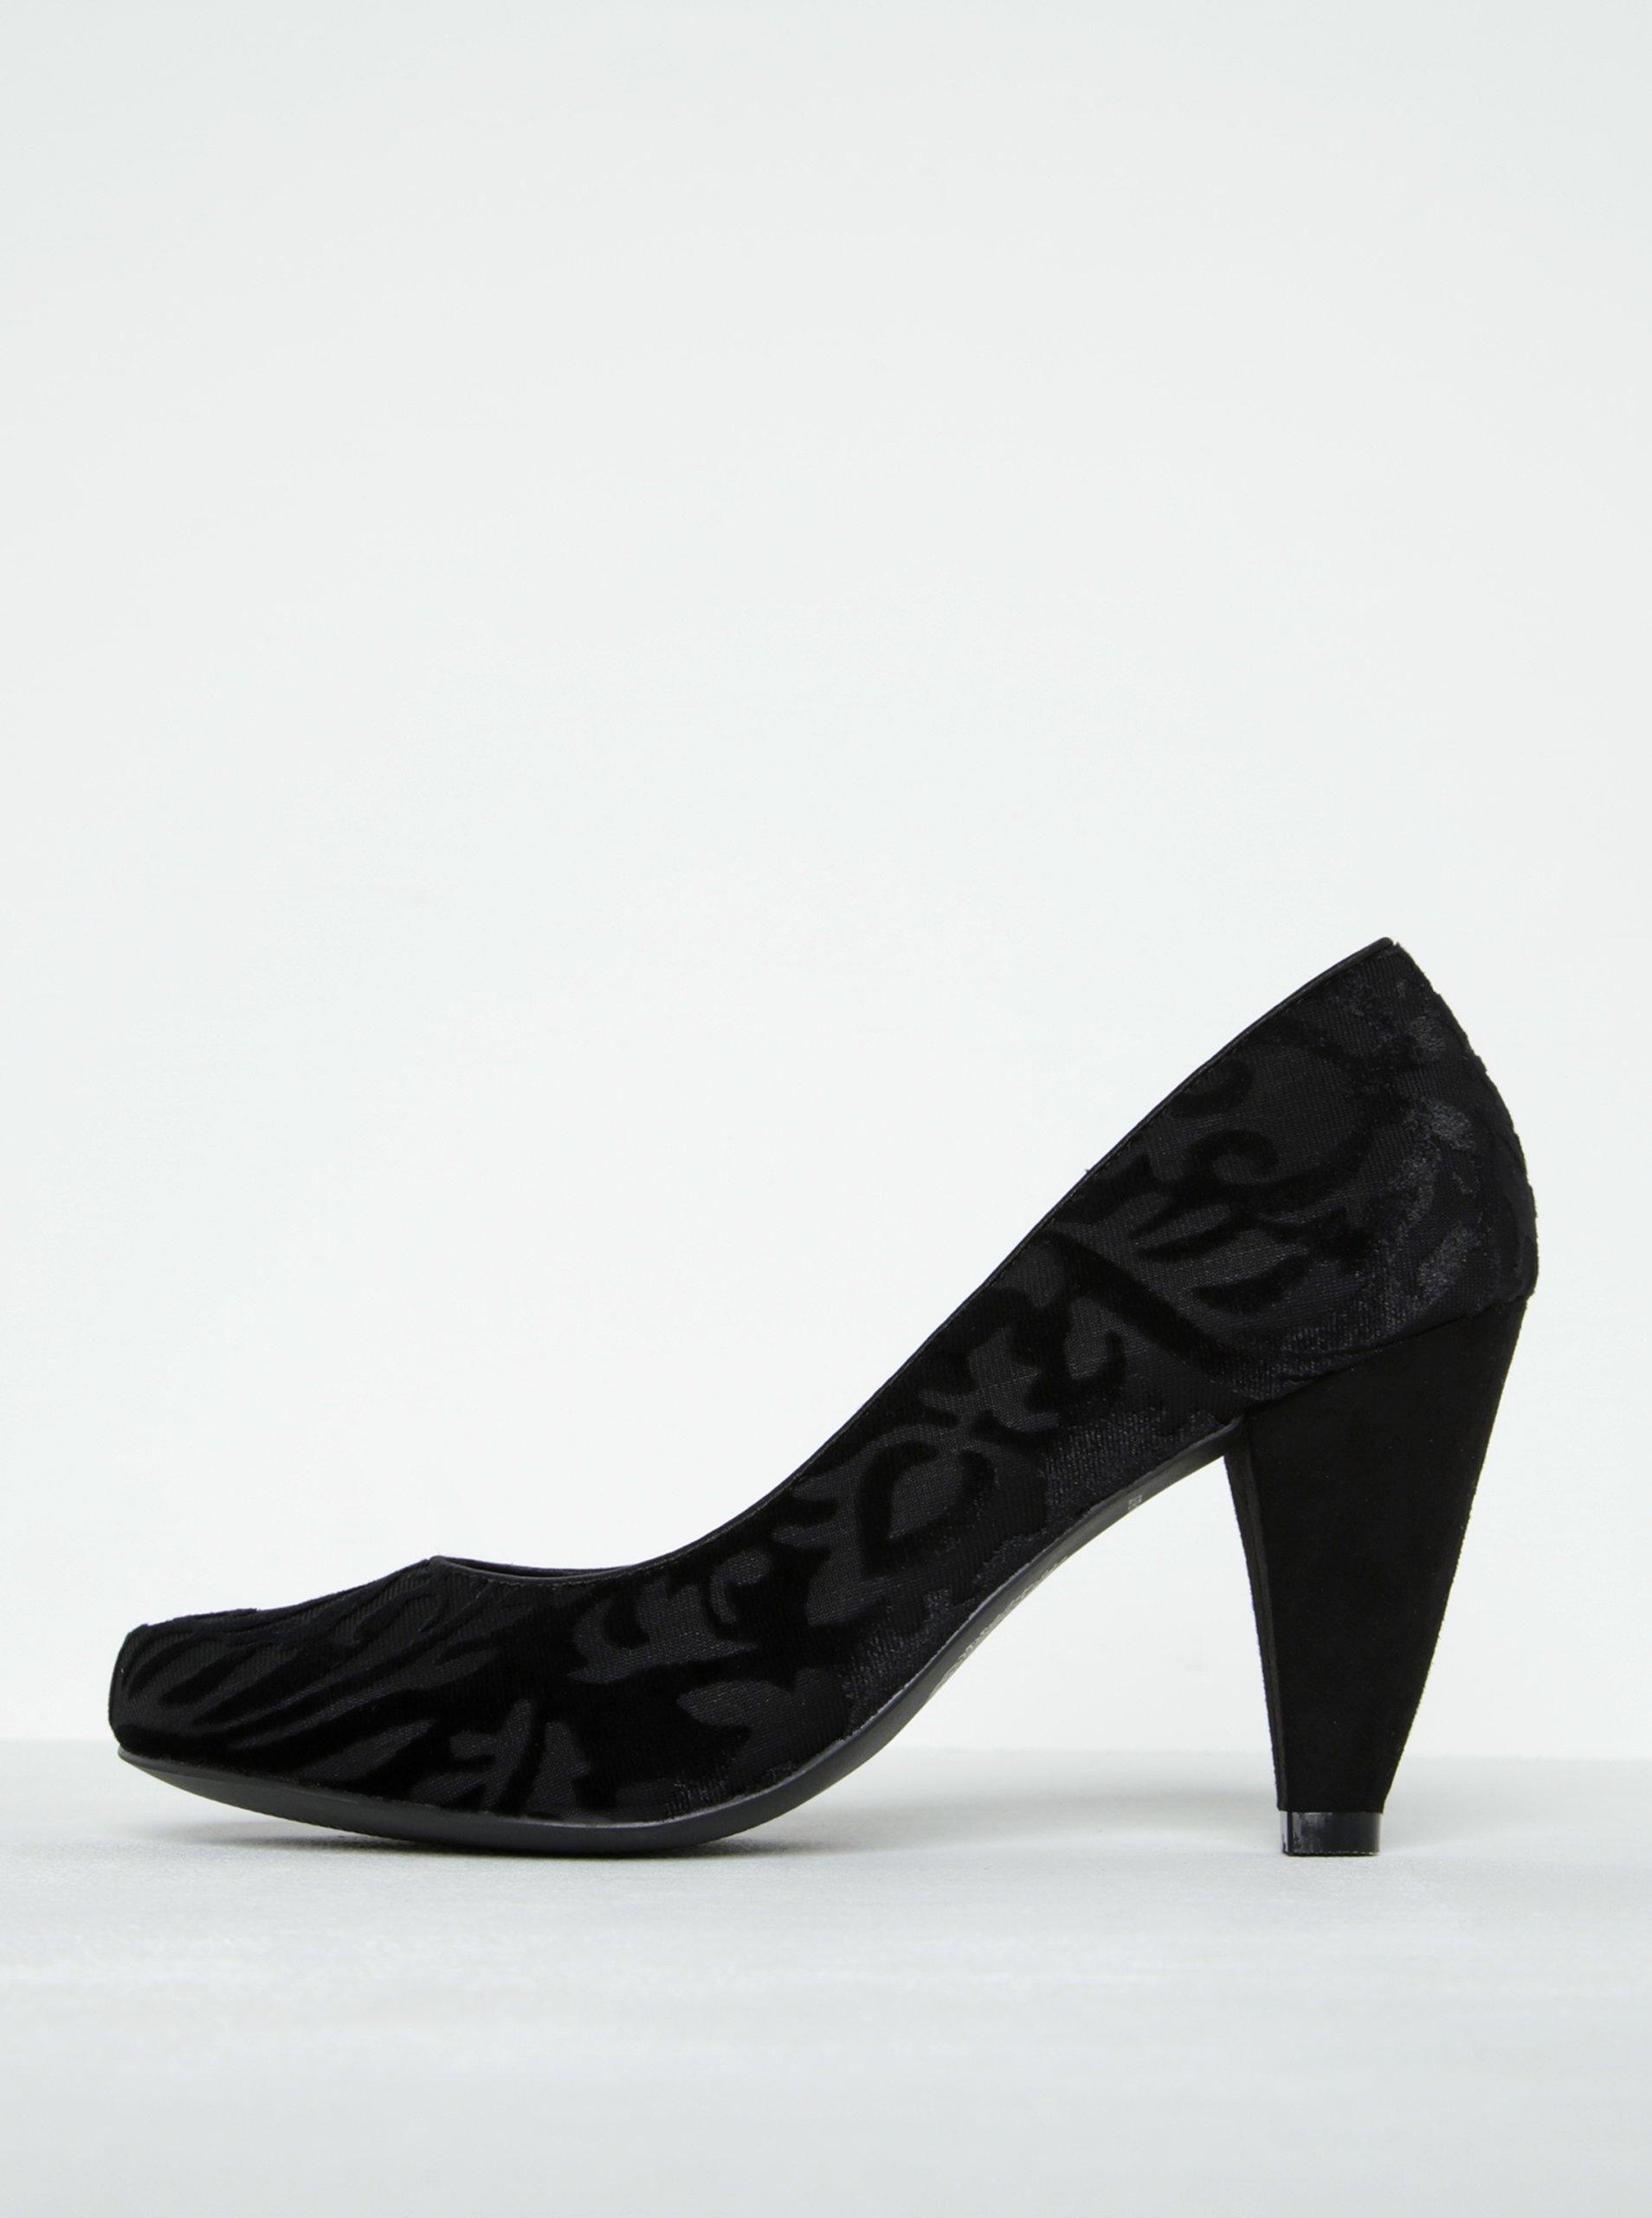 Černé lodičky se sametovým vzorem Ruby Shoo Leah